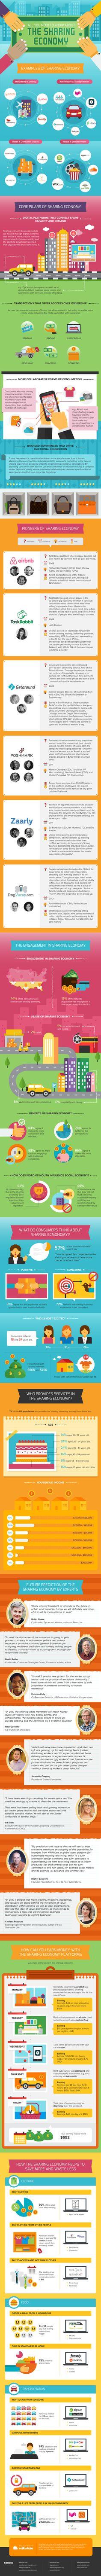 The Sharing Economy #Infographic #Economy